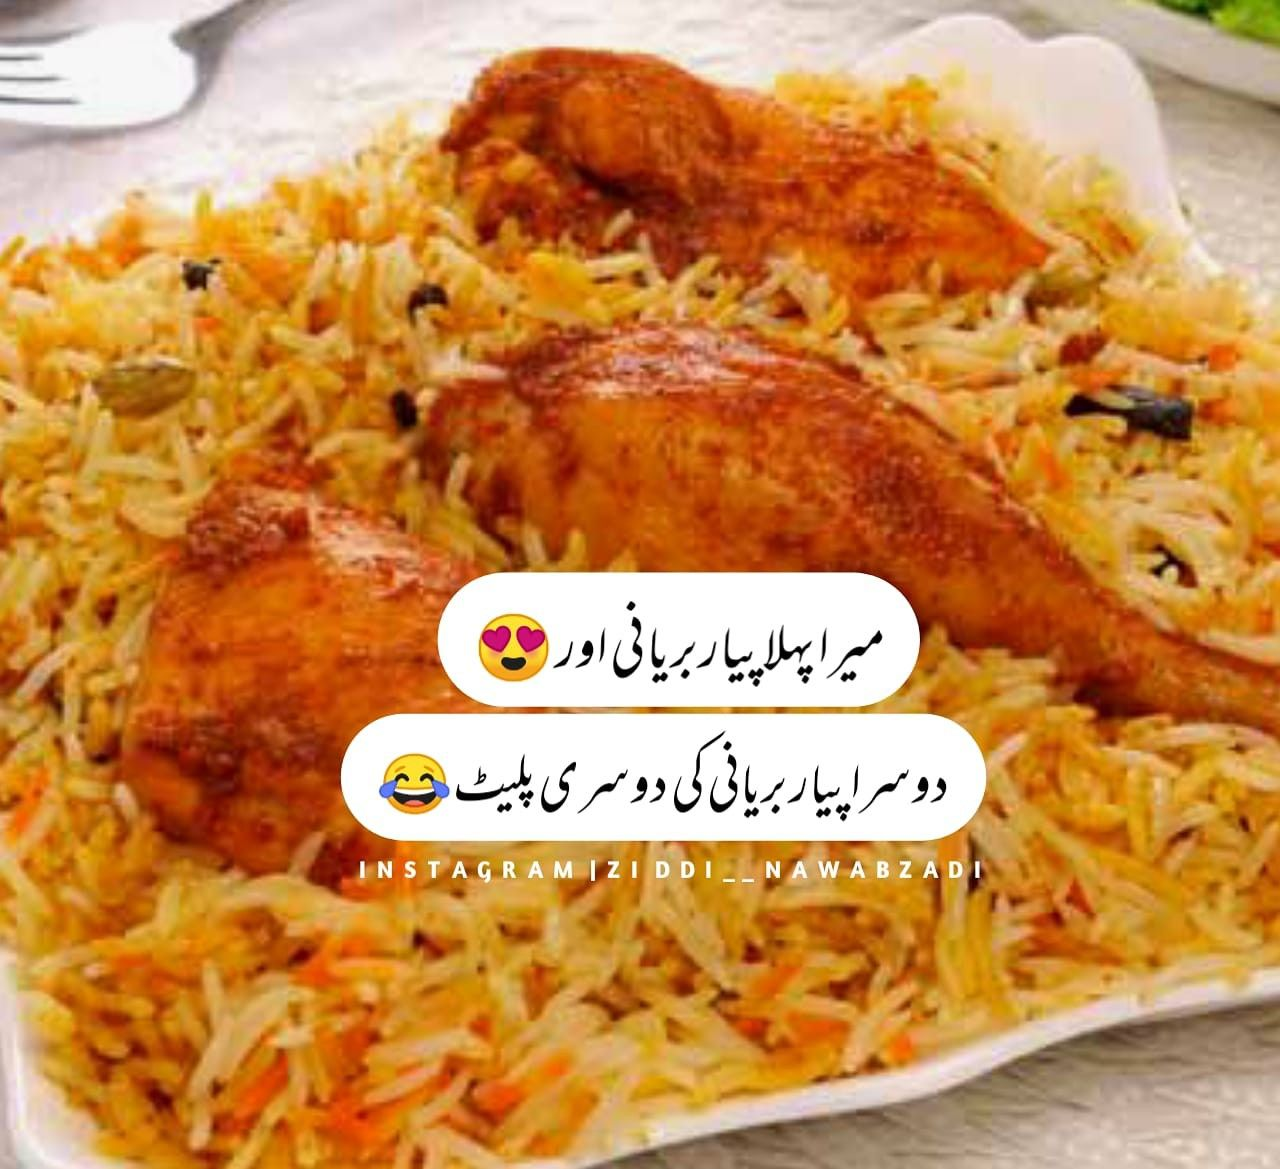 Pin By Azka Khan On Nawabzadi Writes Cute Quotes For Girls Funny Attitude Quotes Fun Quotes Funny